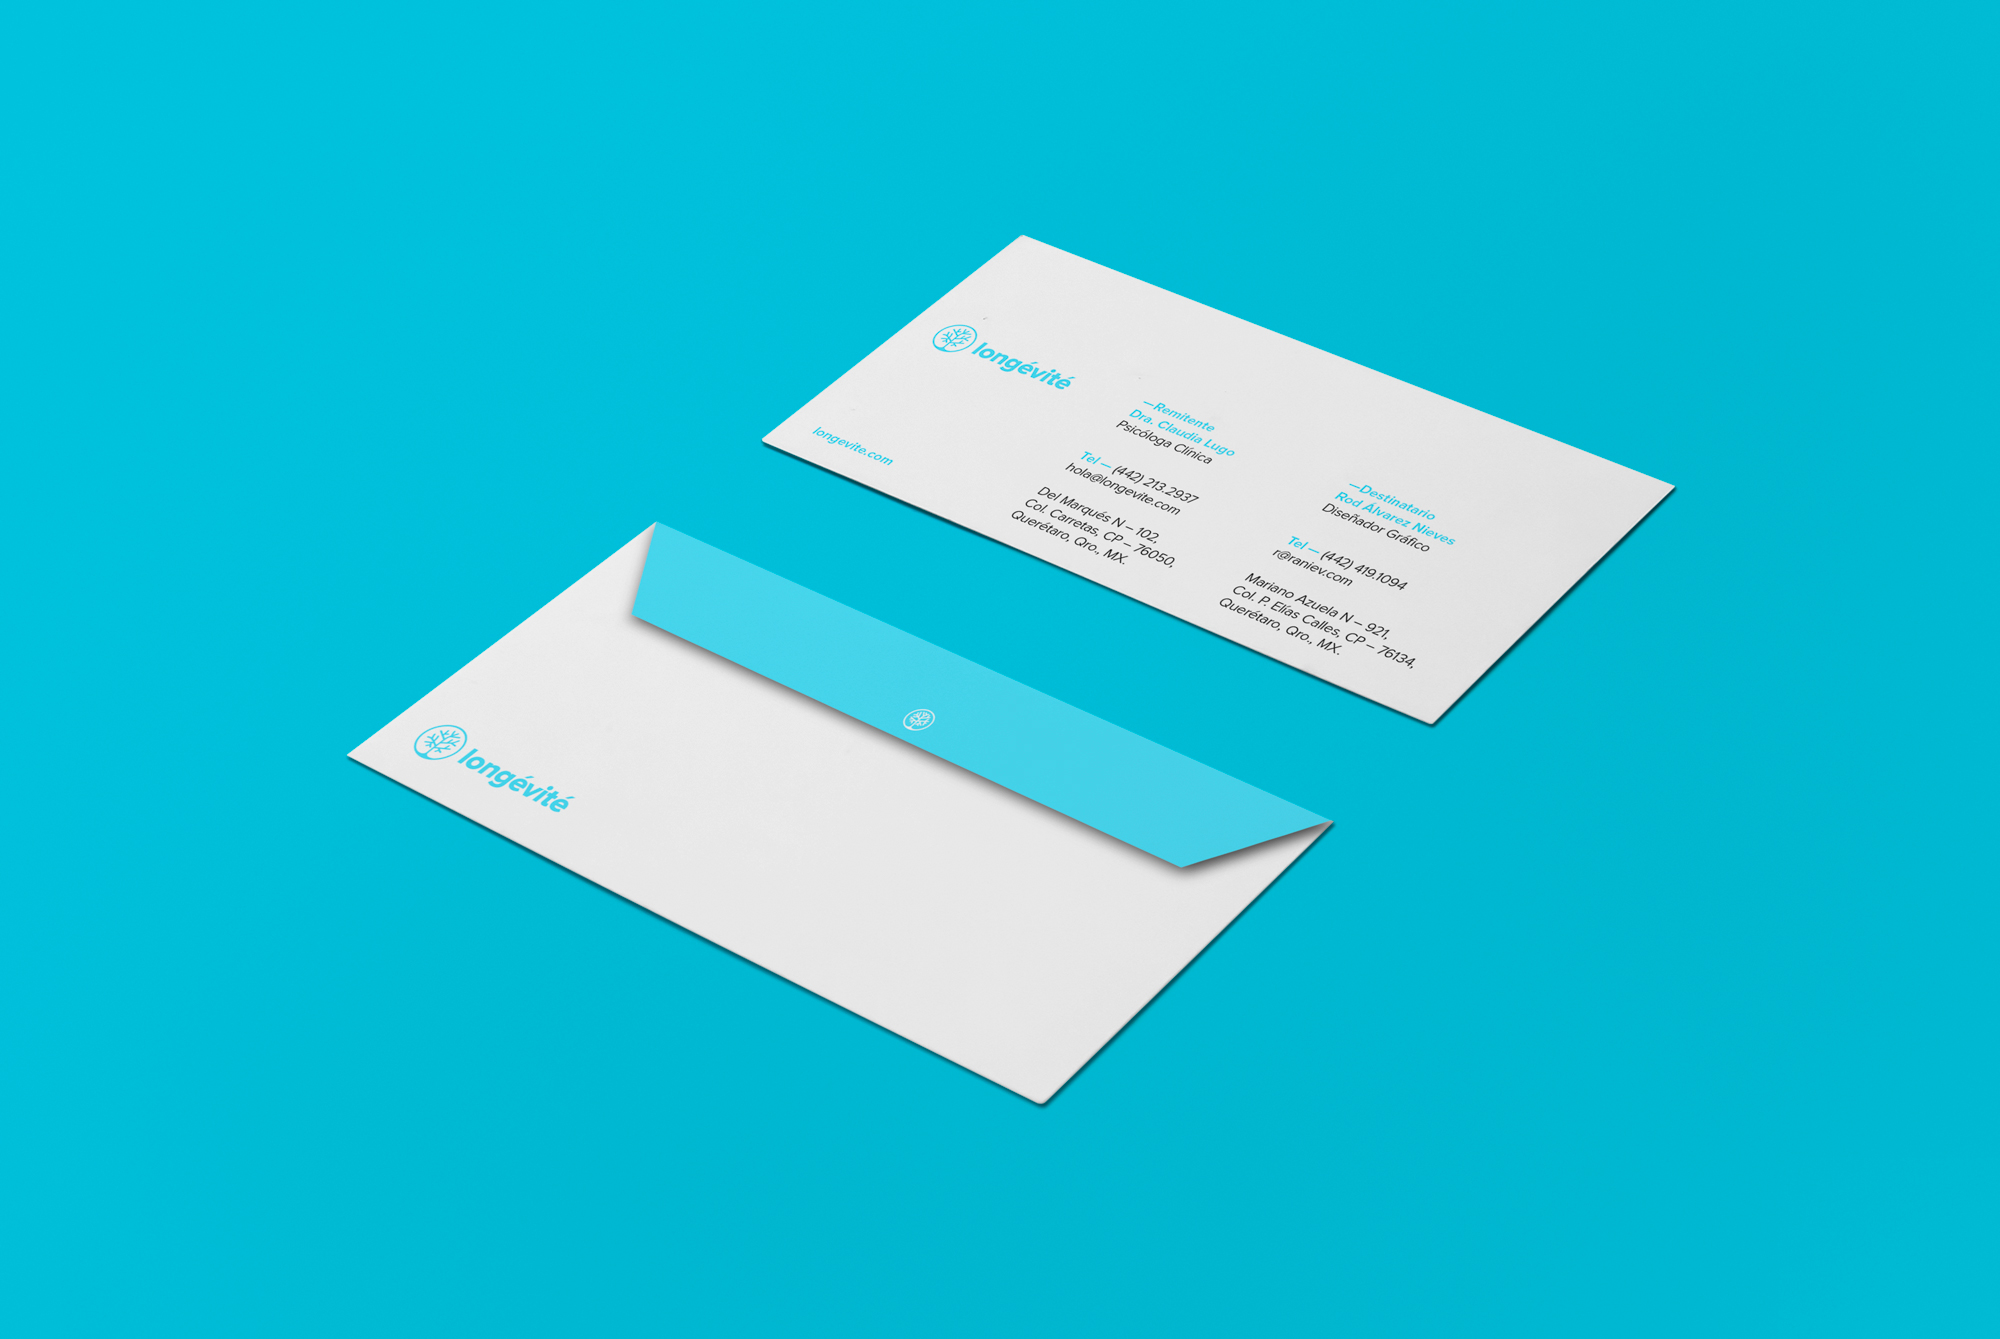 raniev-rod-alvarez-diseño-gráfico-queretaro-longevite-10-envelope